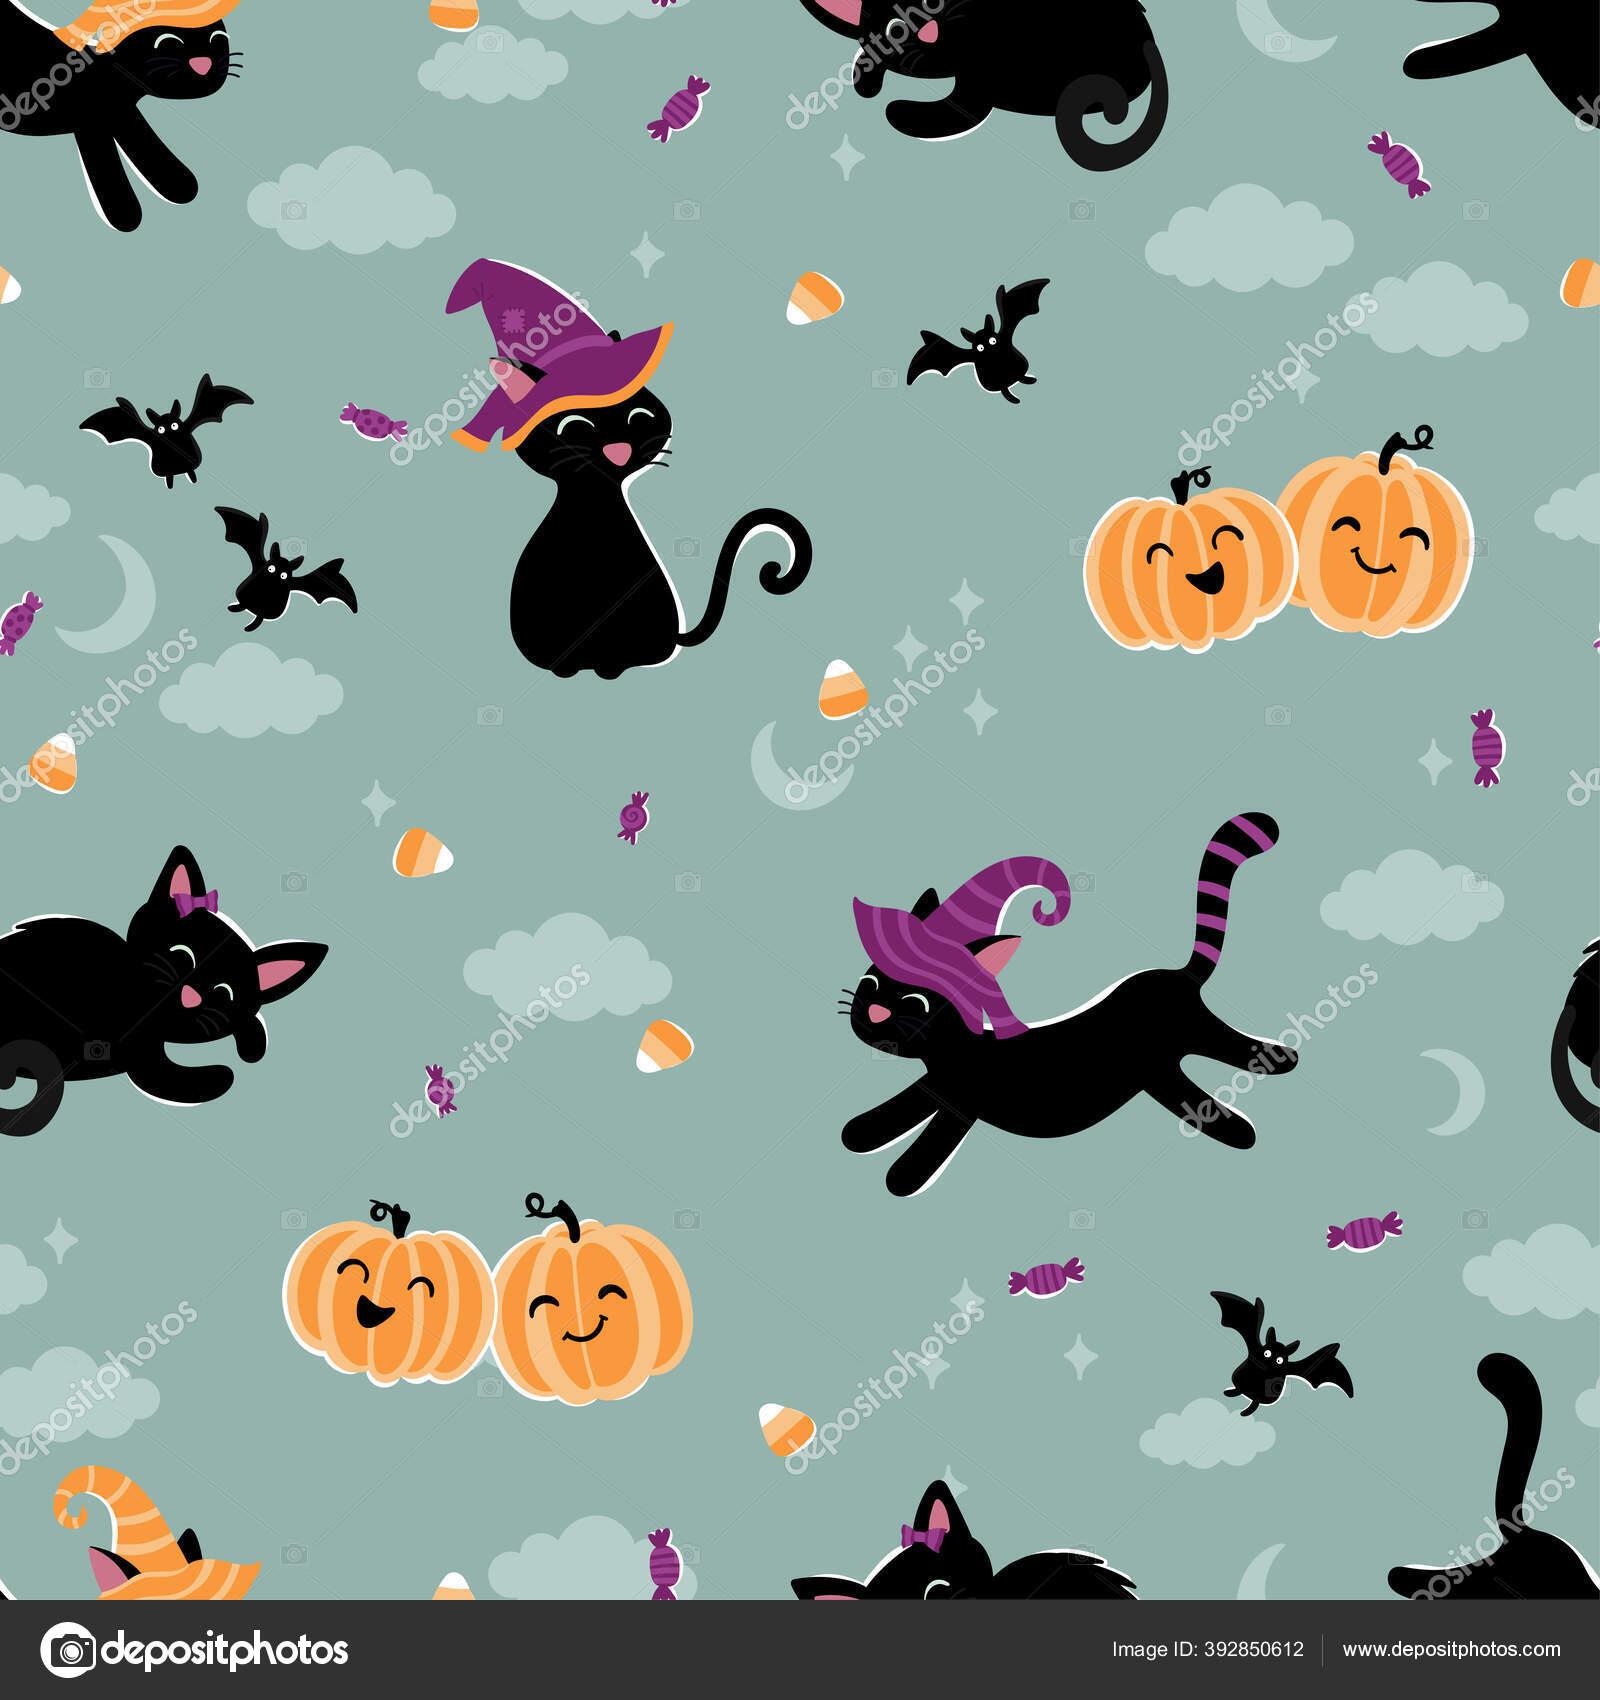 depositphotos 392850612 stock illustration cute hand drawn halloween seamless